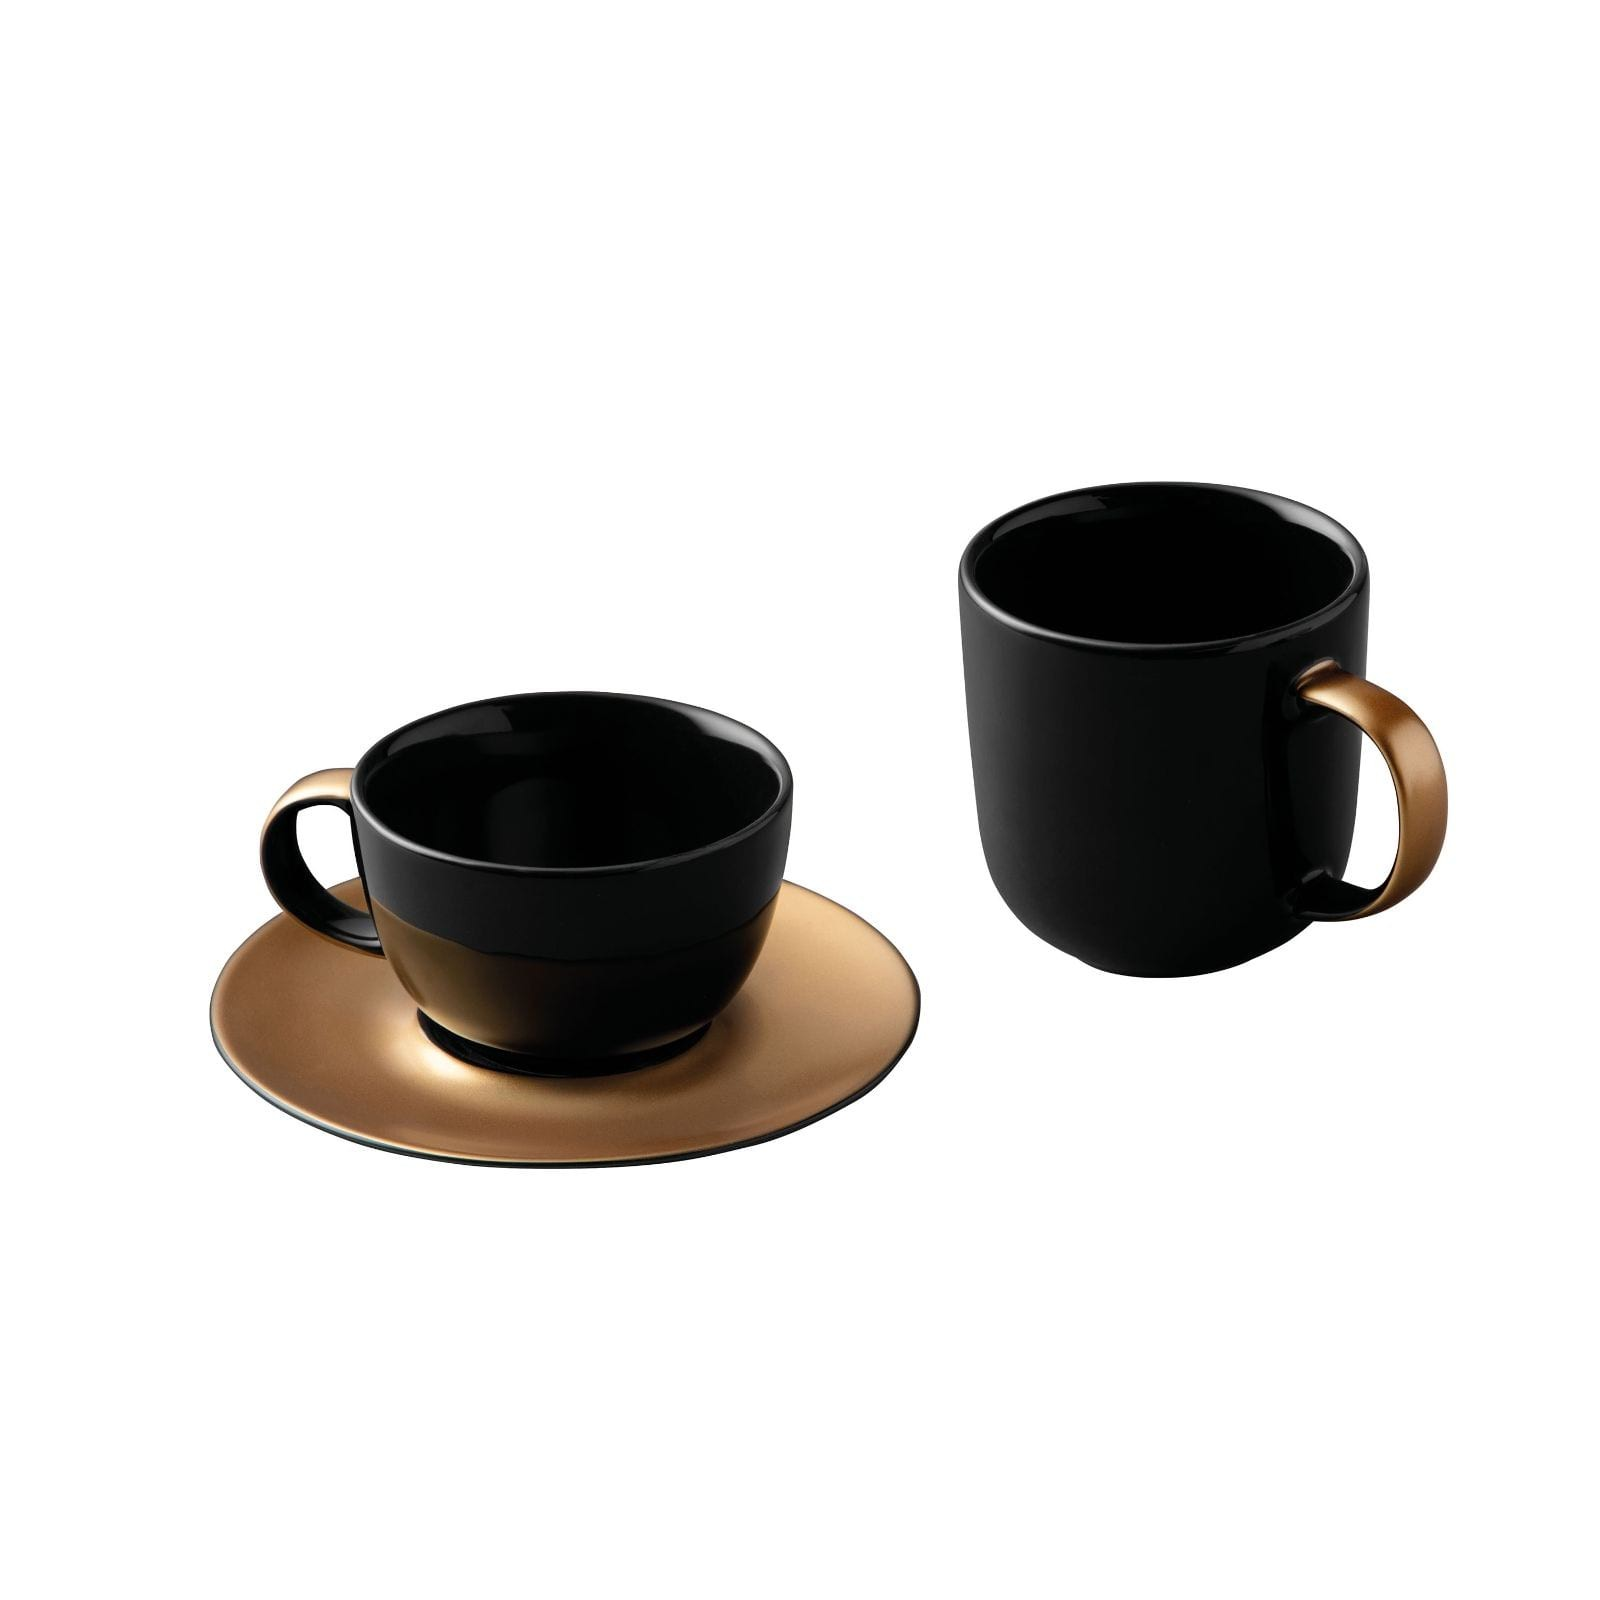 Gem Coffee and Tea 3-pc Set (Black / Gold) - BergHOFF